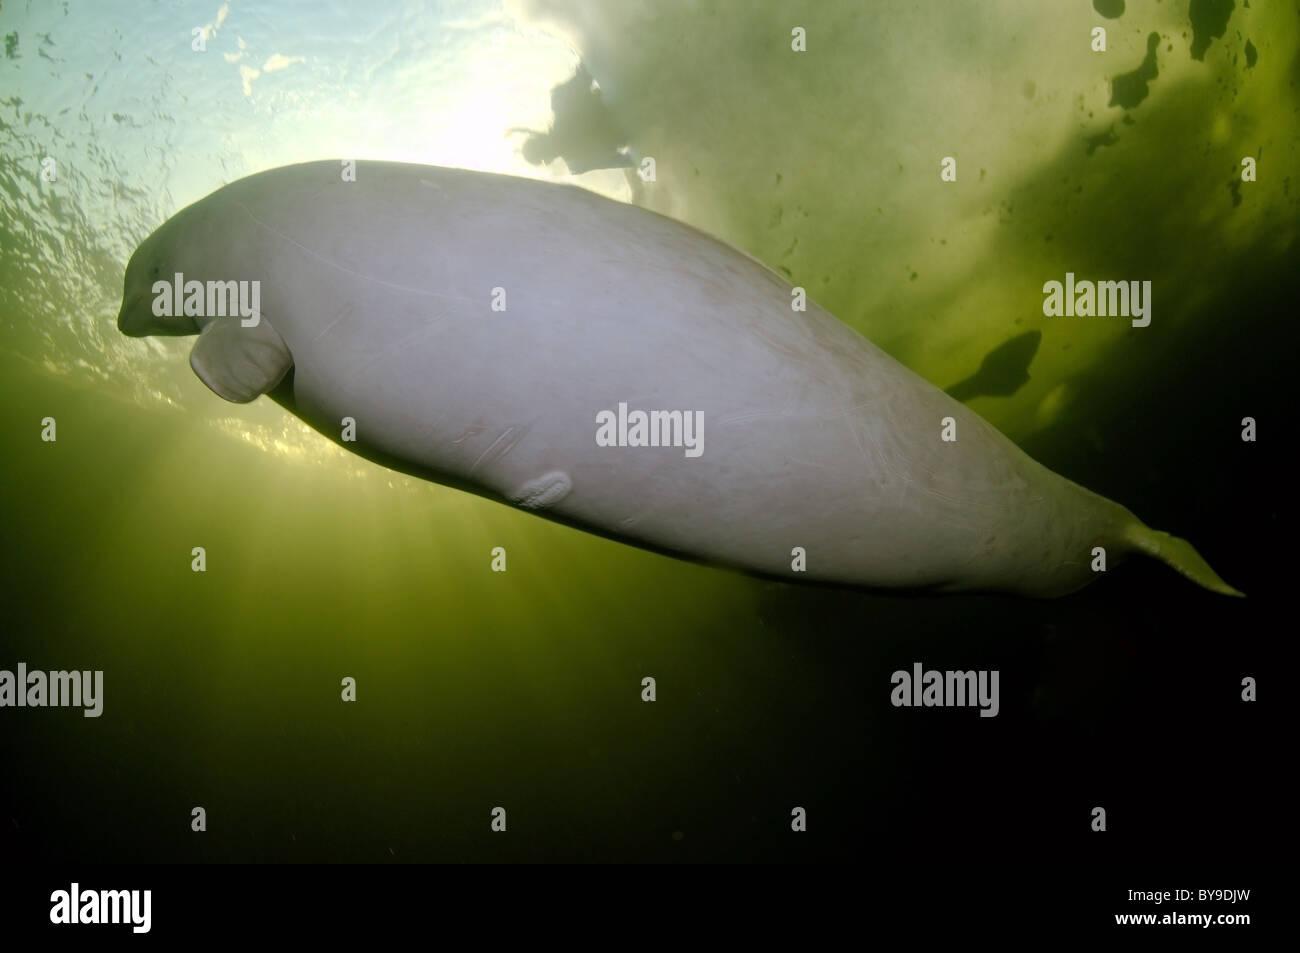 Beluga swims under ice. white whale, Delphinapterus leucas - Stock Image